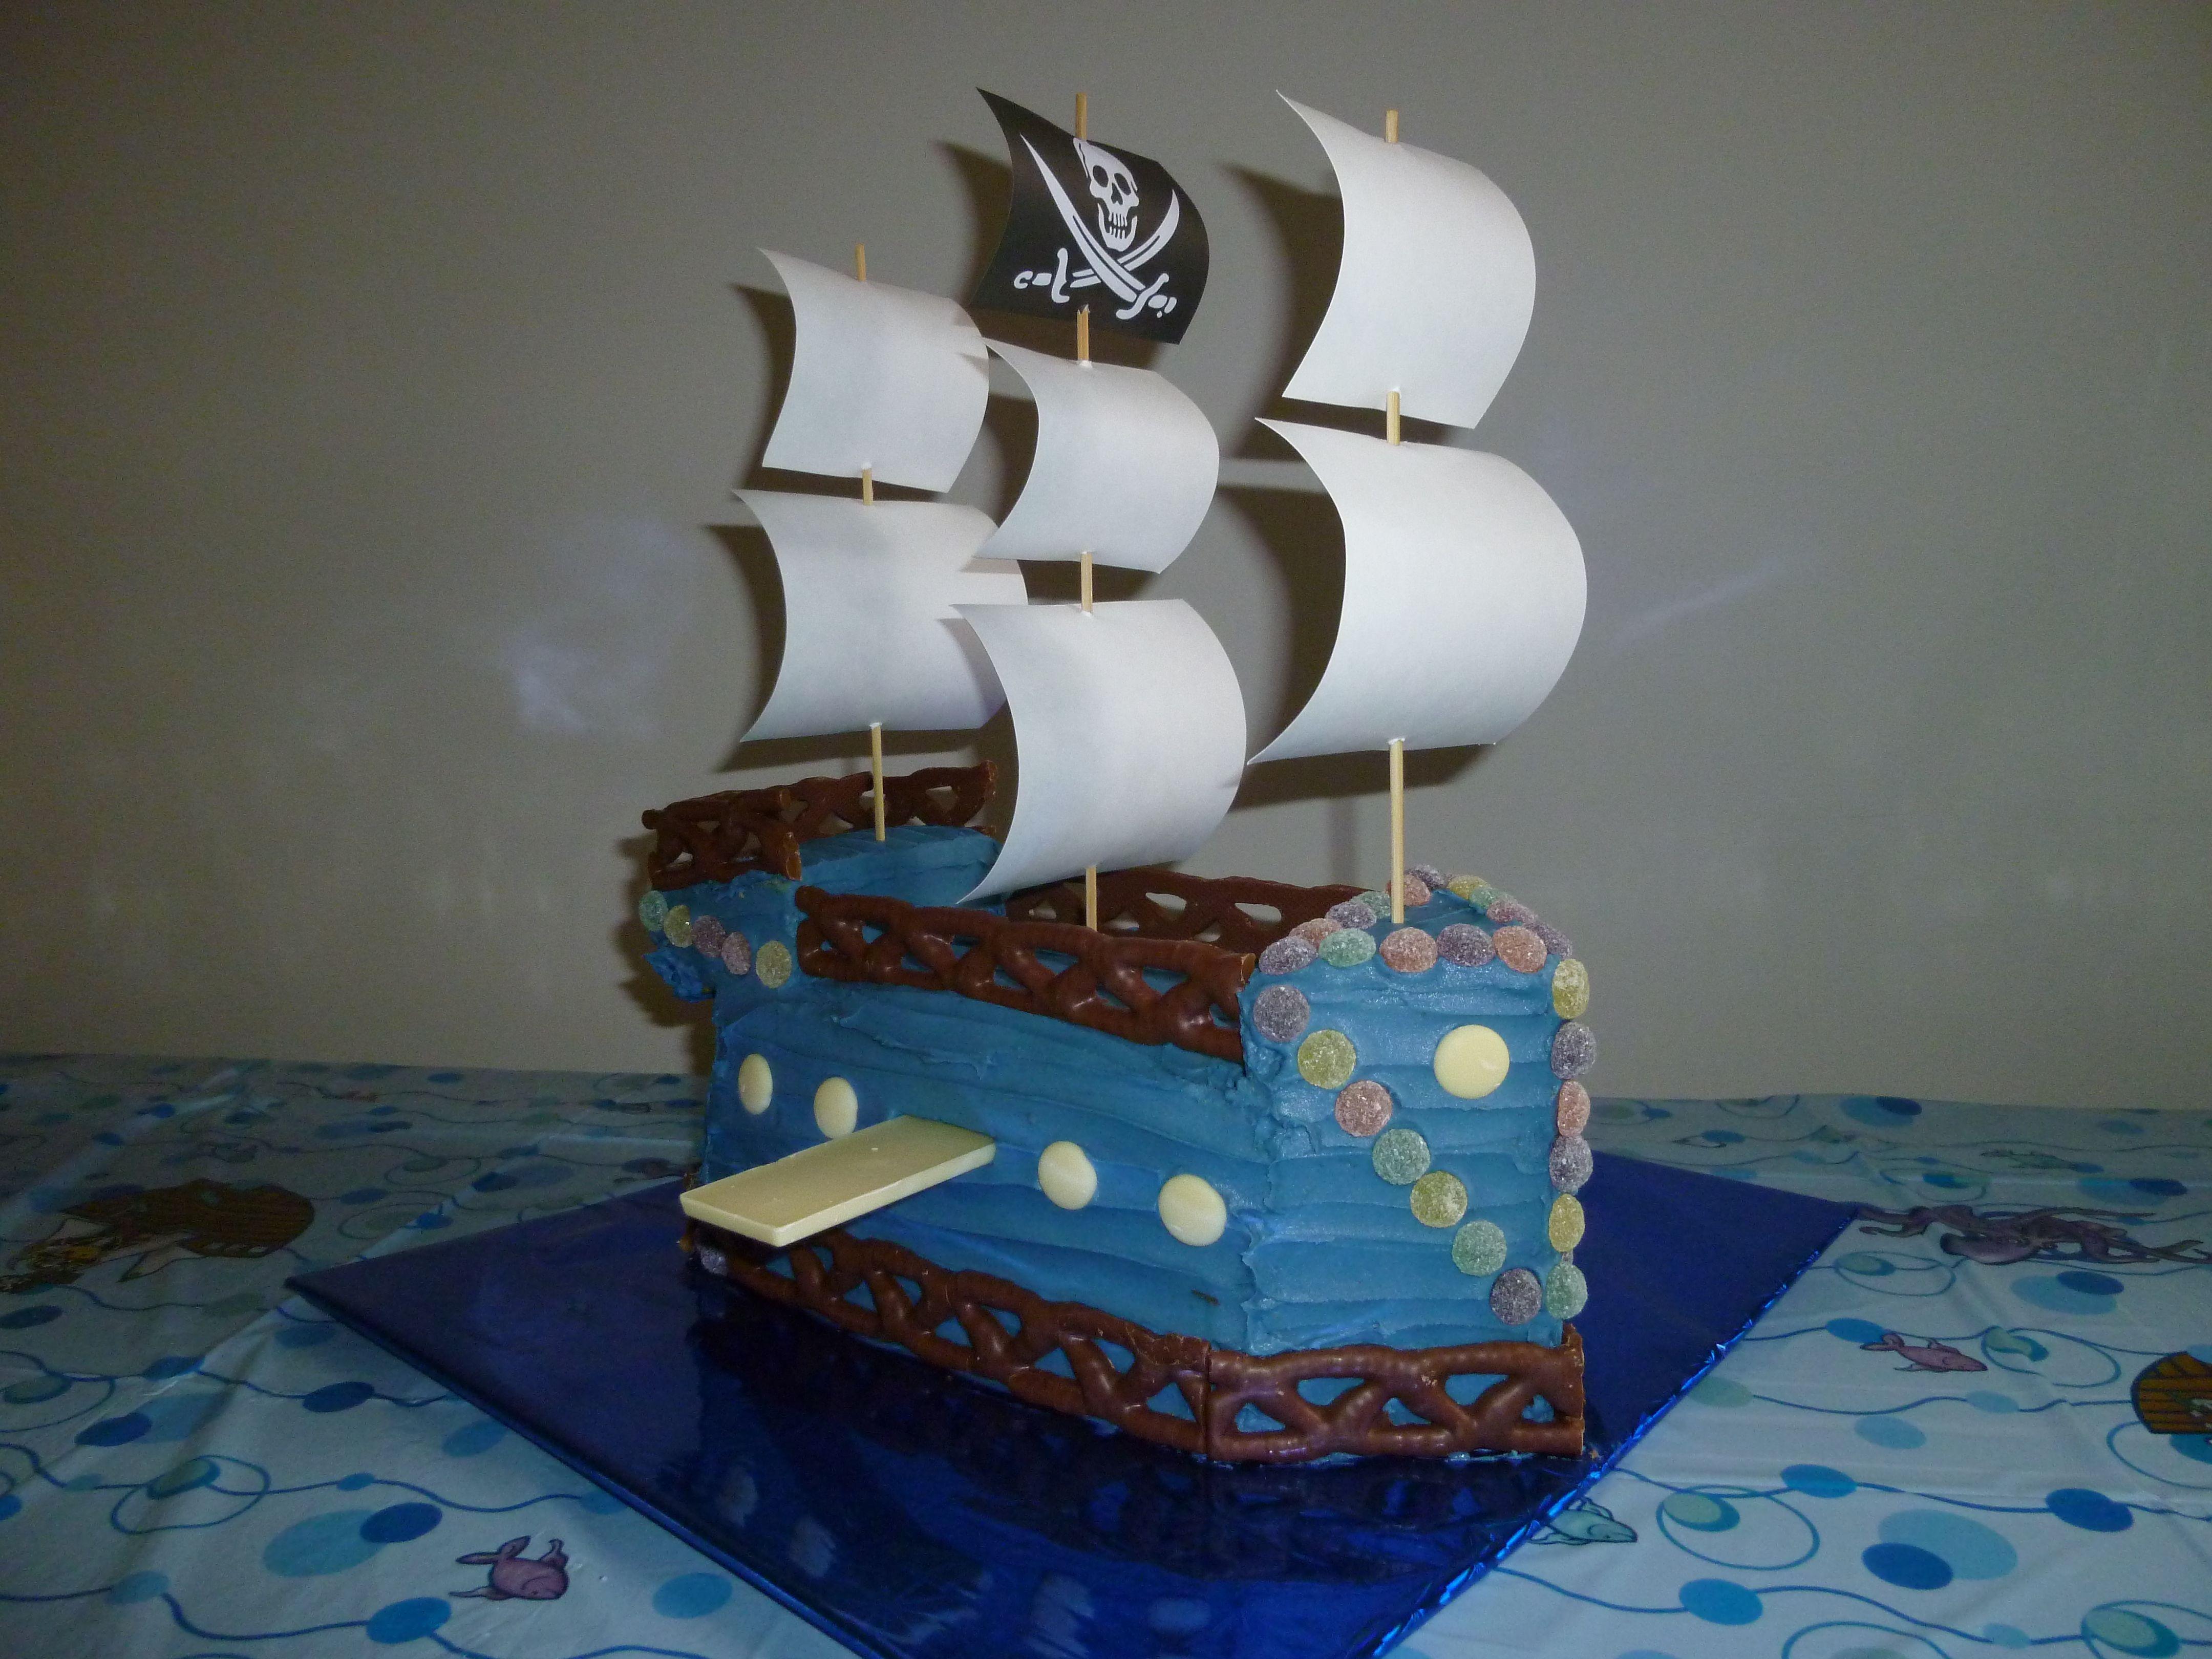 Homemade 1st birthday pirate ship cake for noah